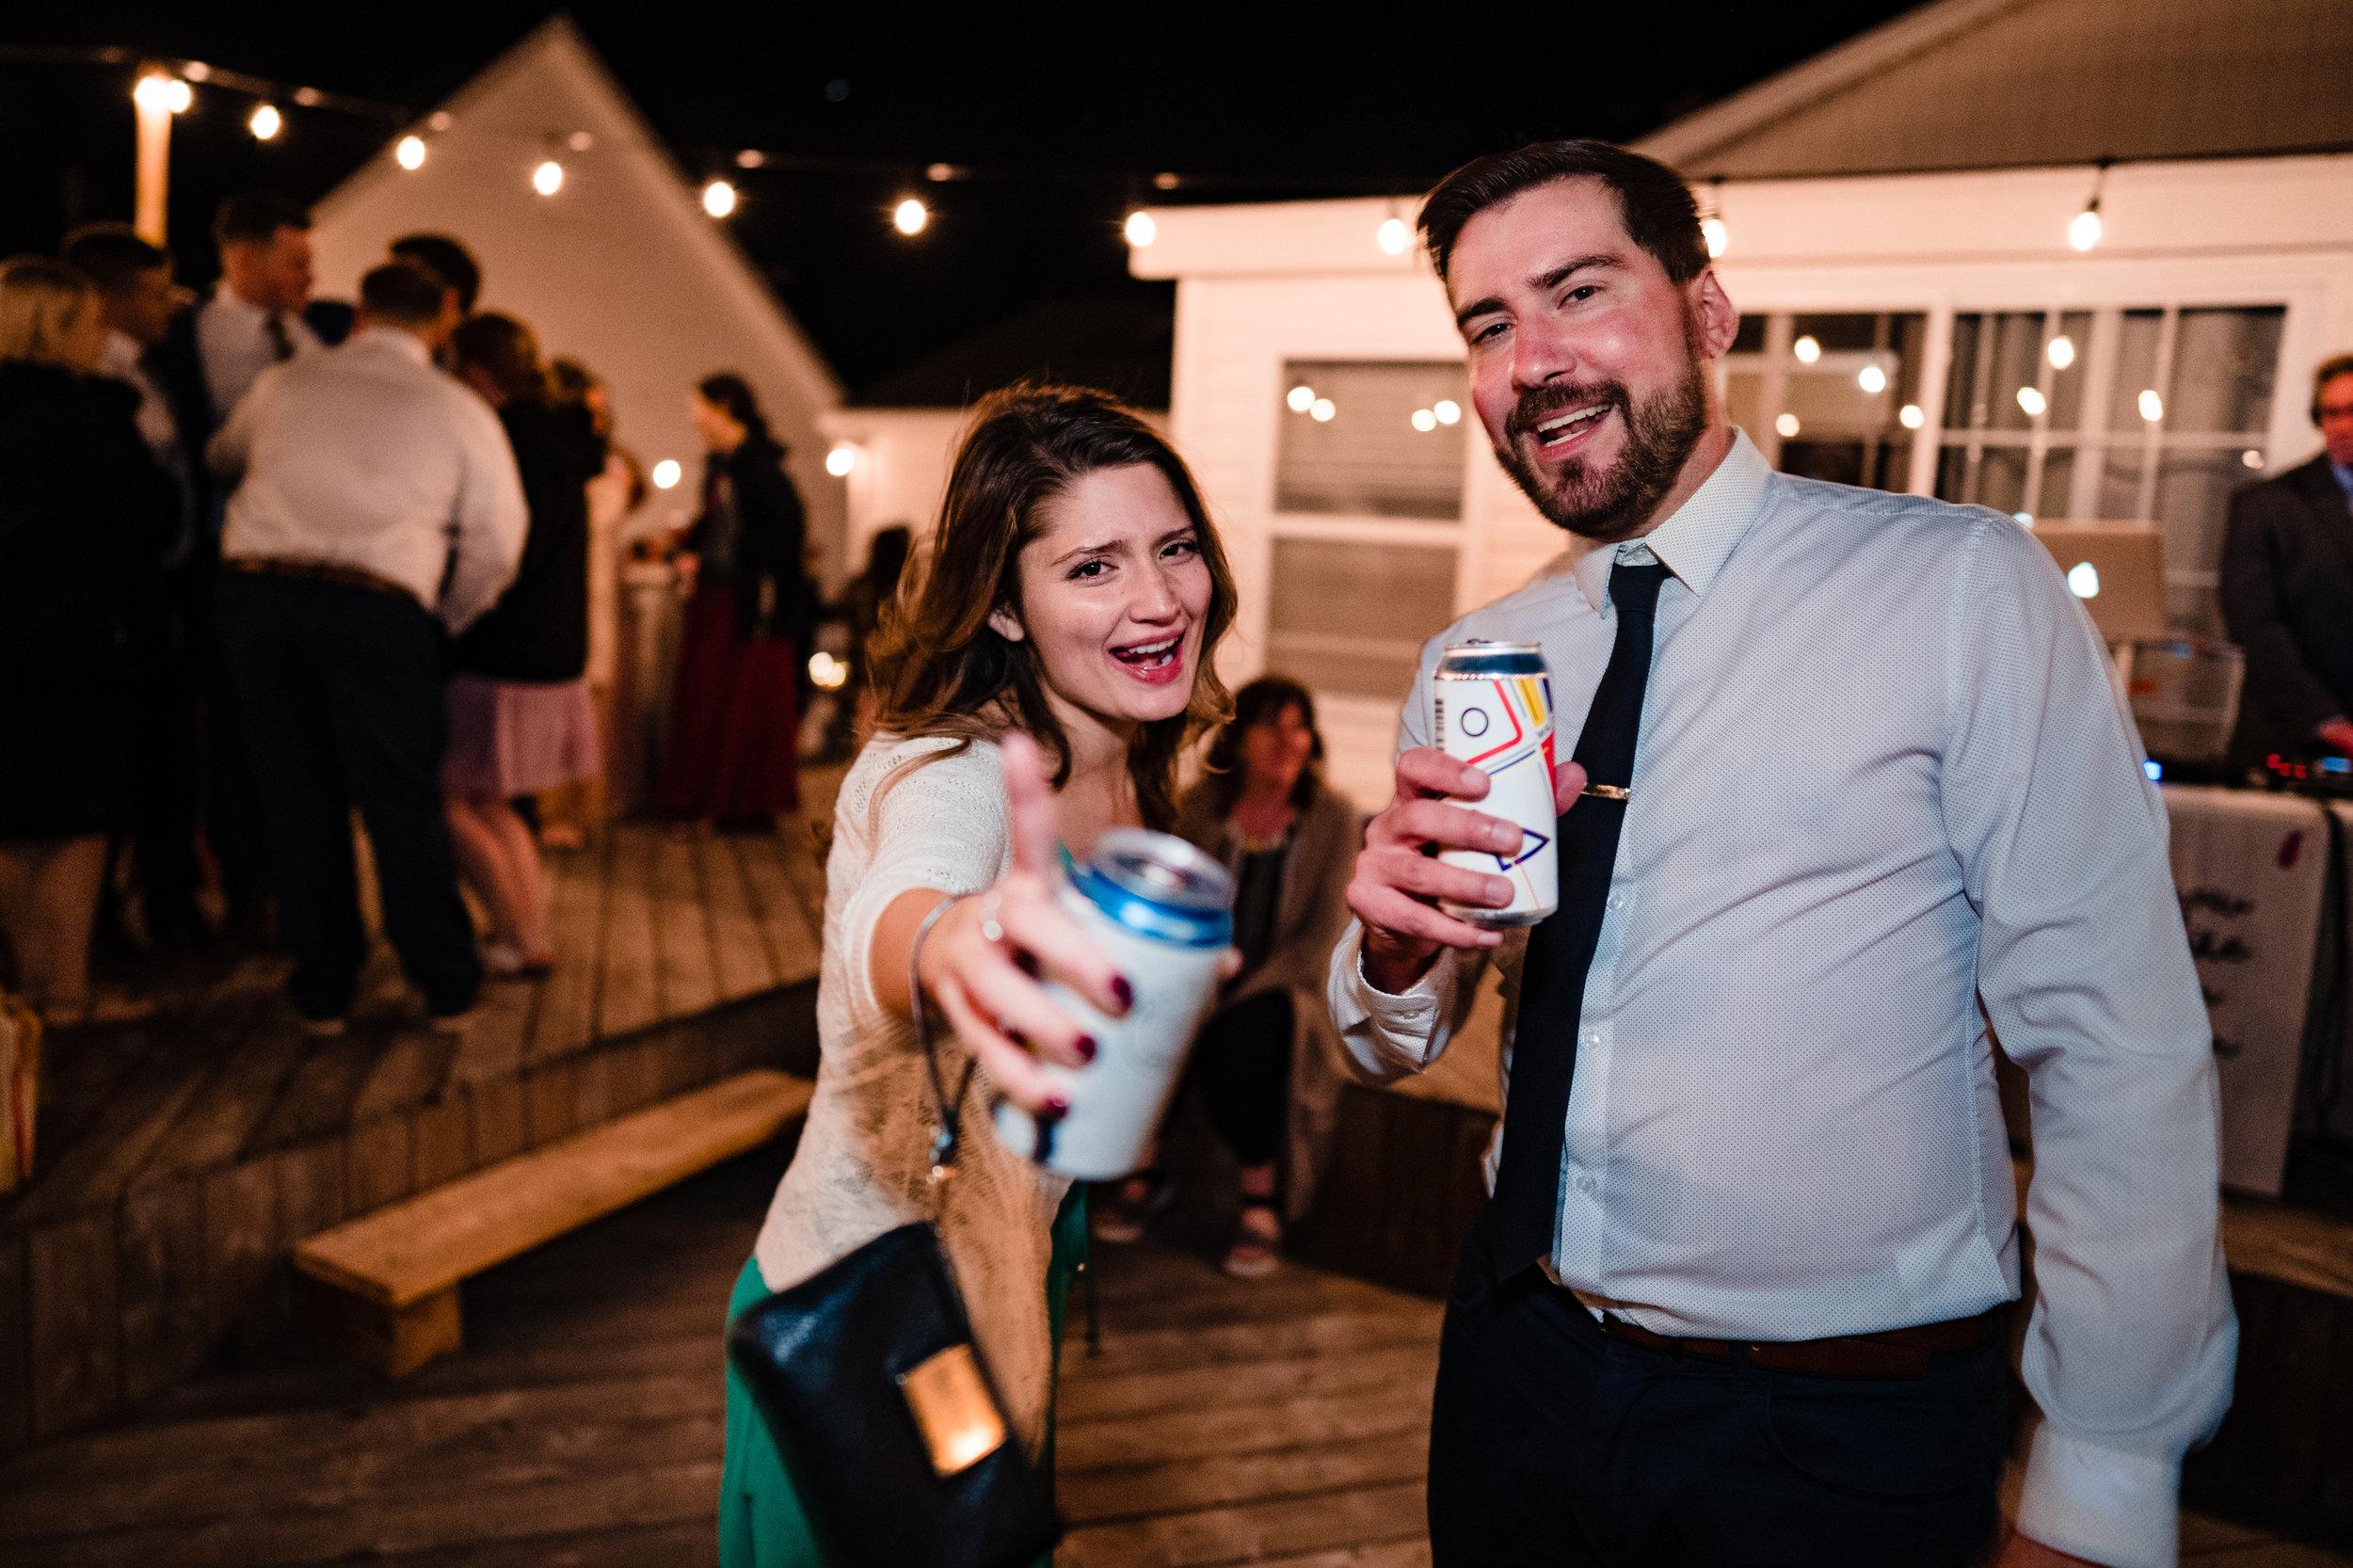 Janelle-Mitch-Halifax-Wedding-Nova-Scotia-Photography (160 of 163).jpg